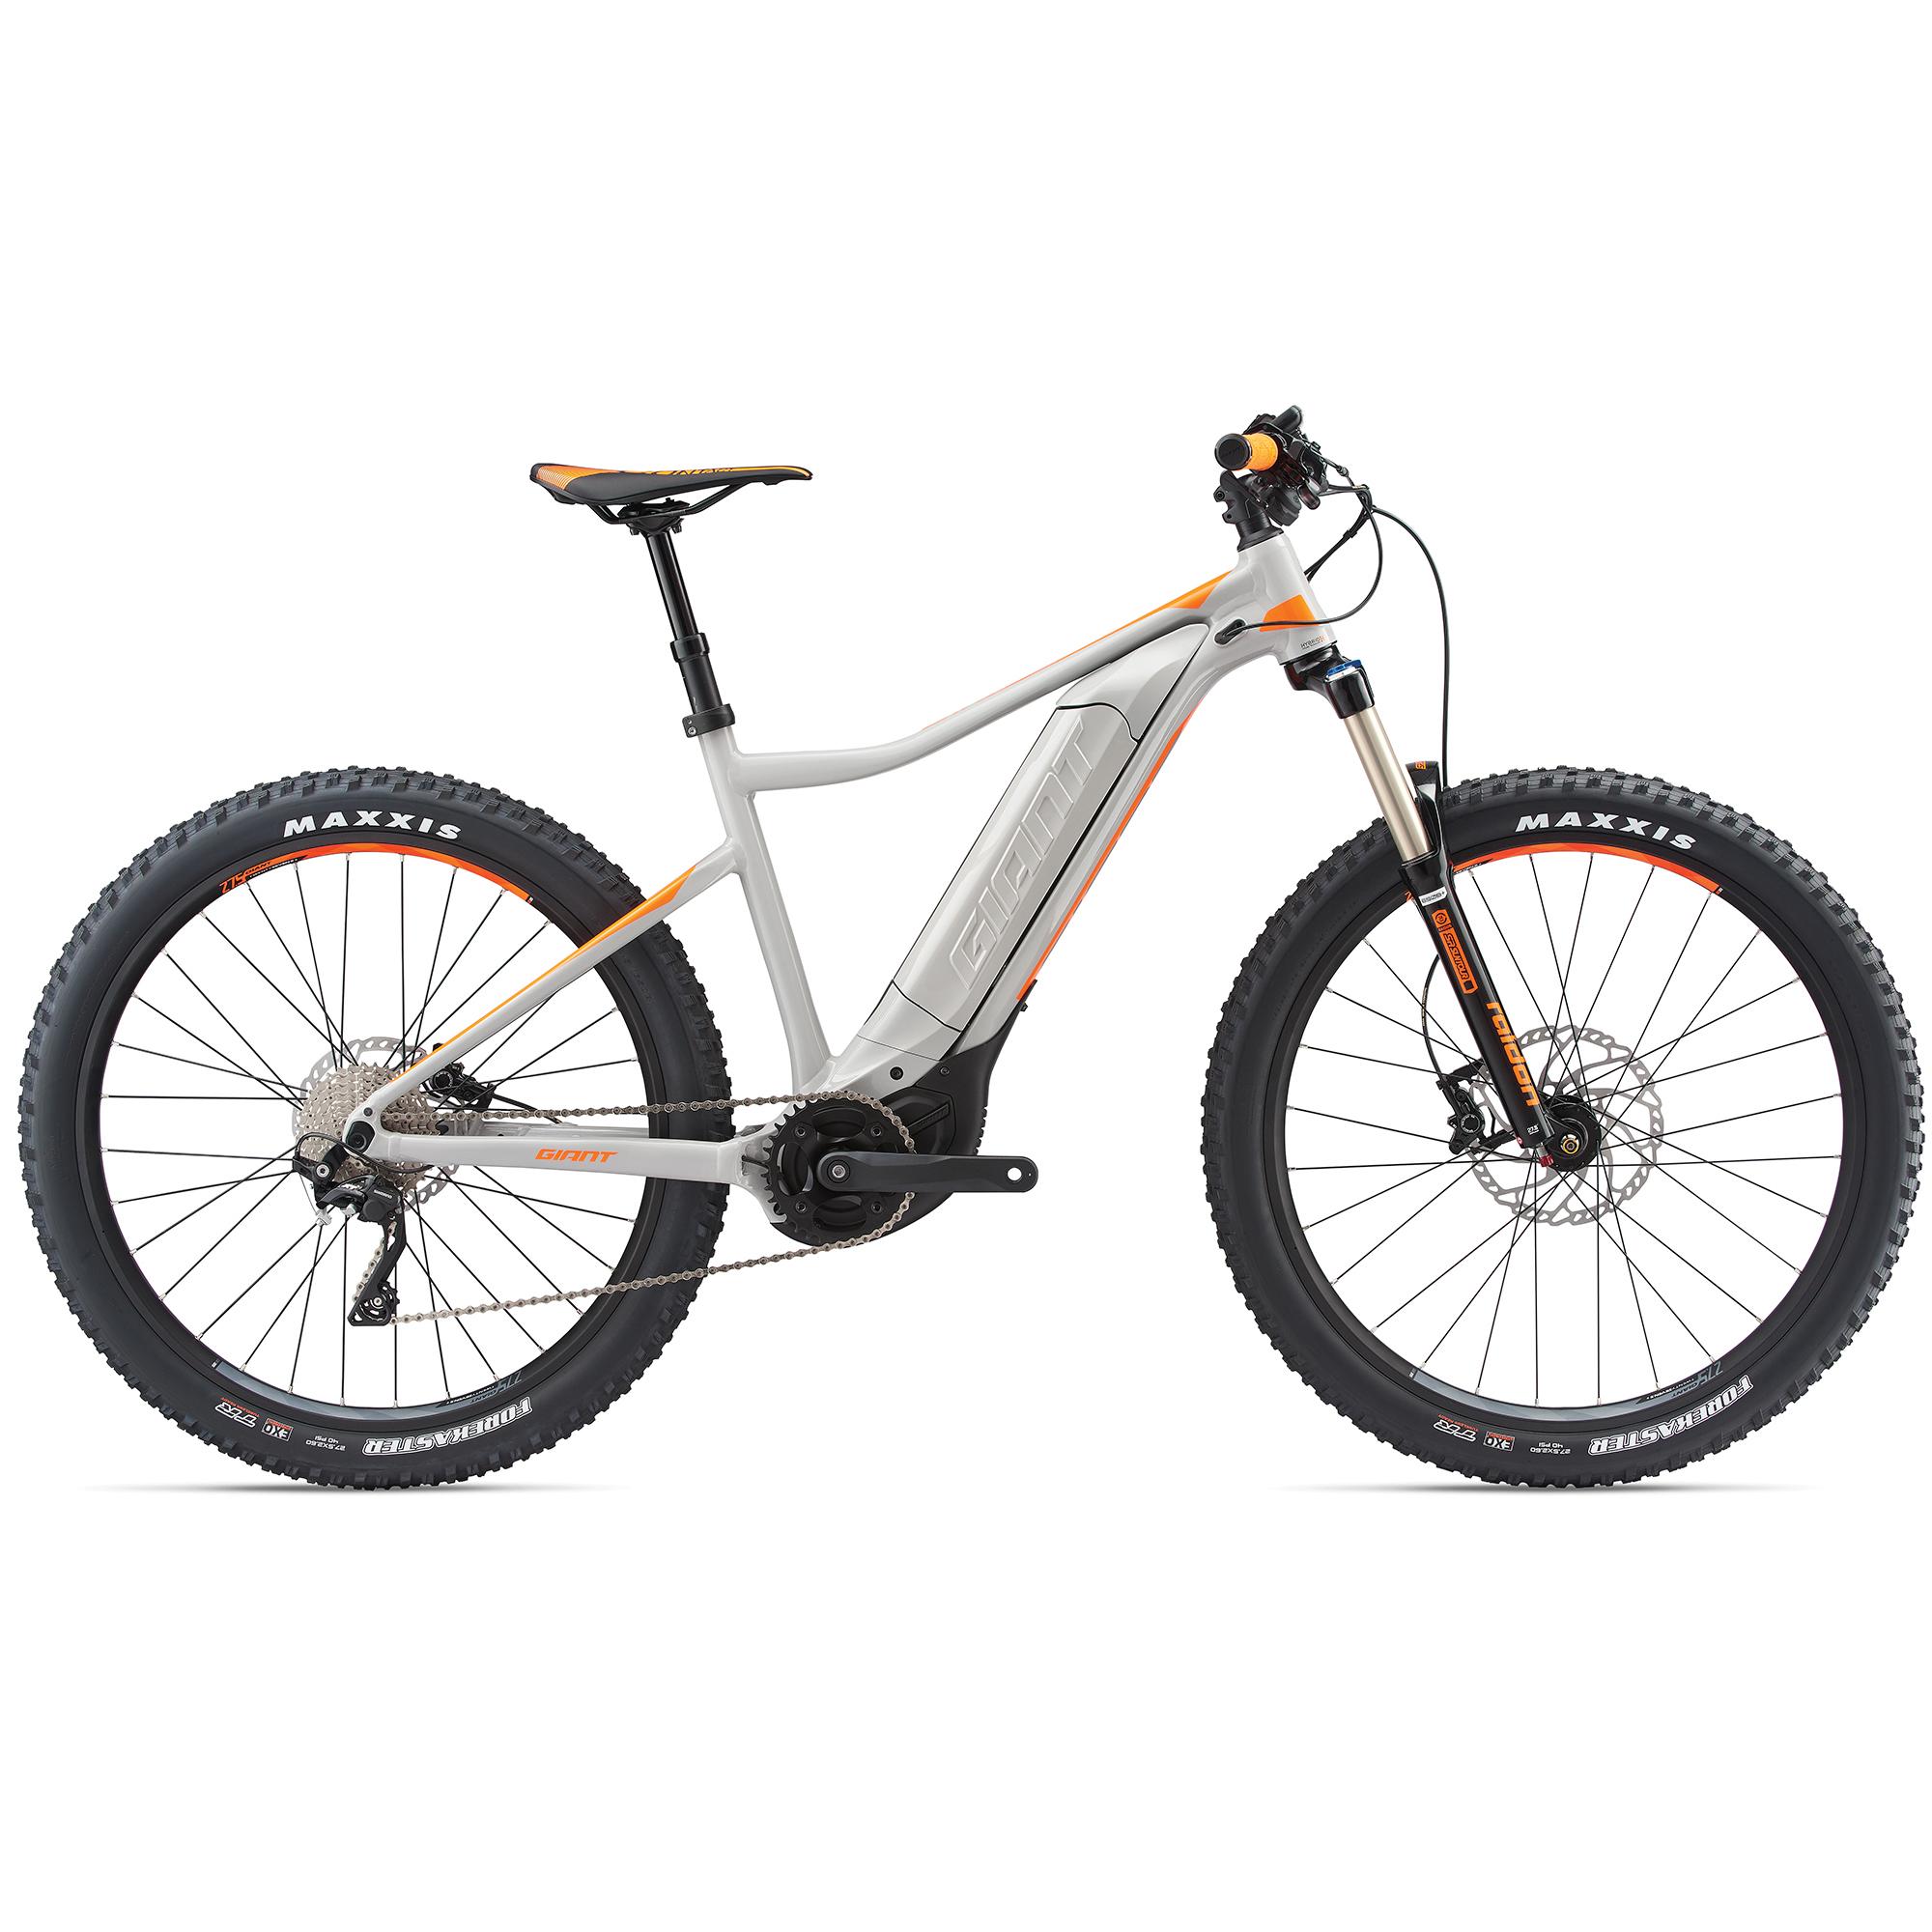 giant dirt e 2 pro grau orange 2018 online kaufen bmo bike mailorder. Black Bedroom Furniture Sets. Home Design Ideas